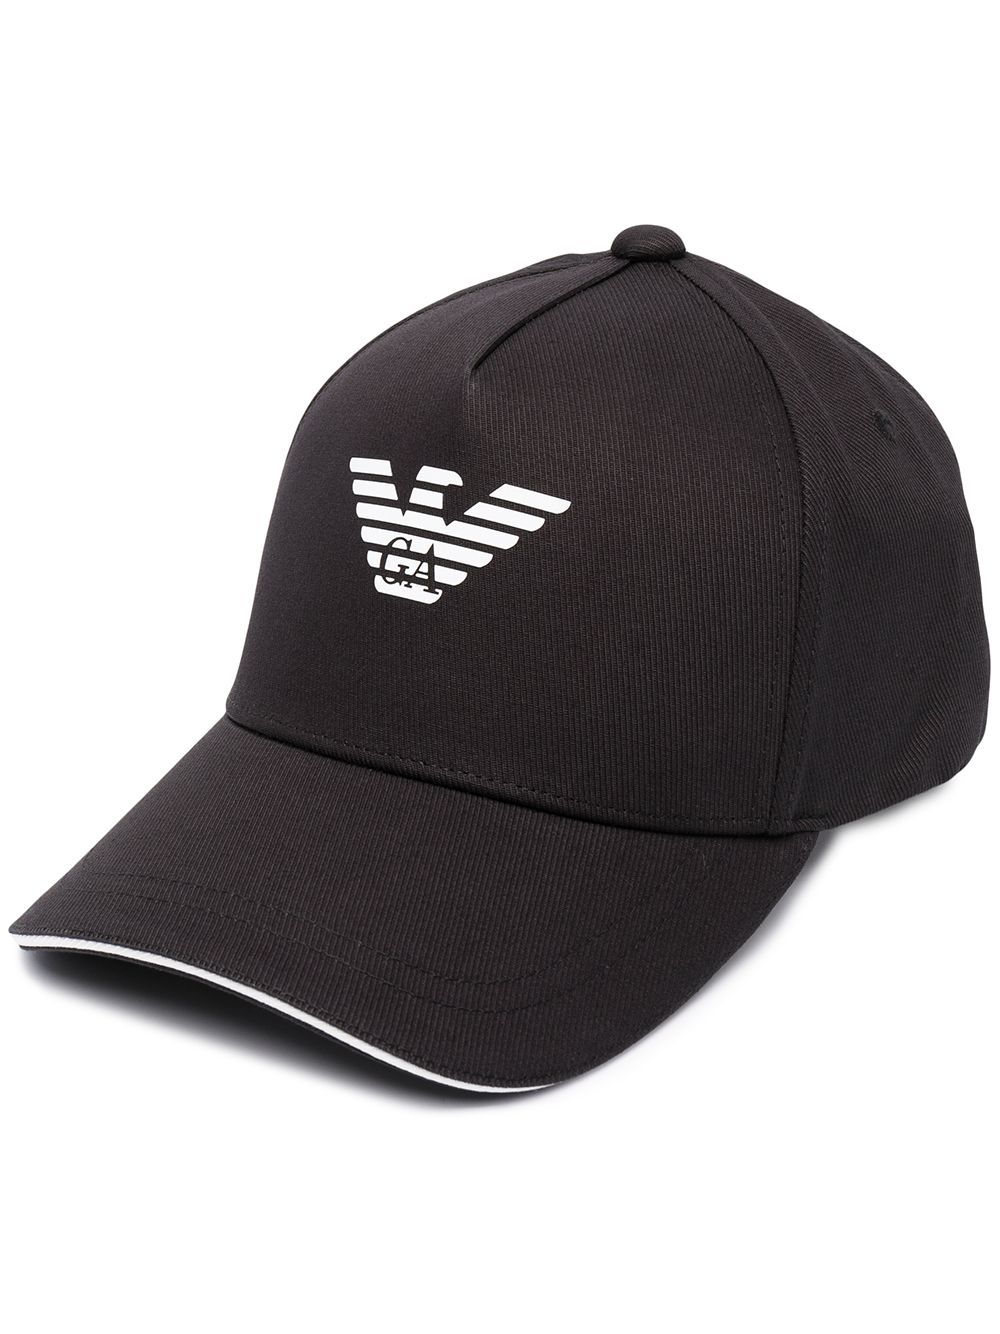 Cappello dabaseball con logo